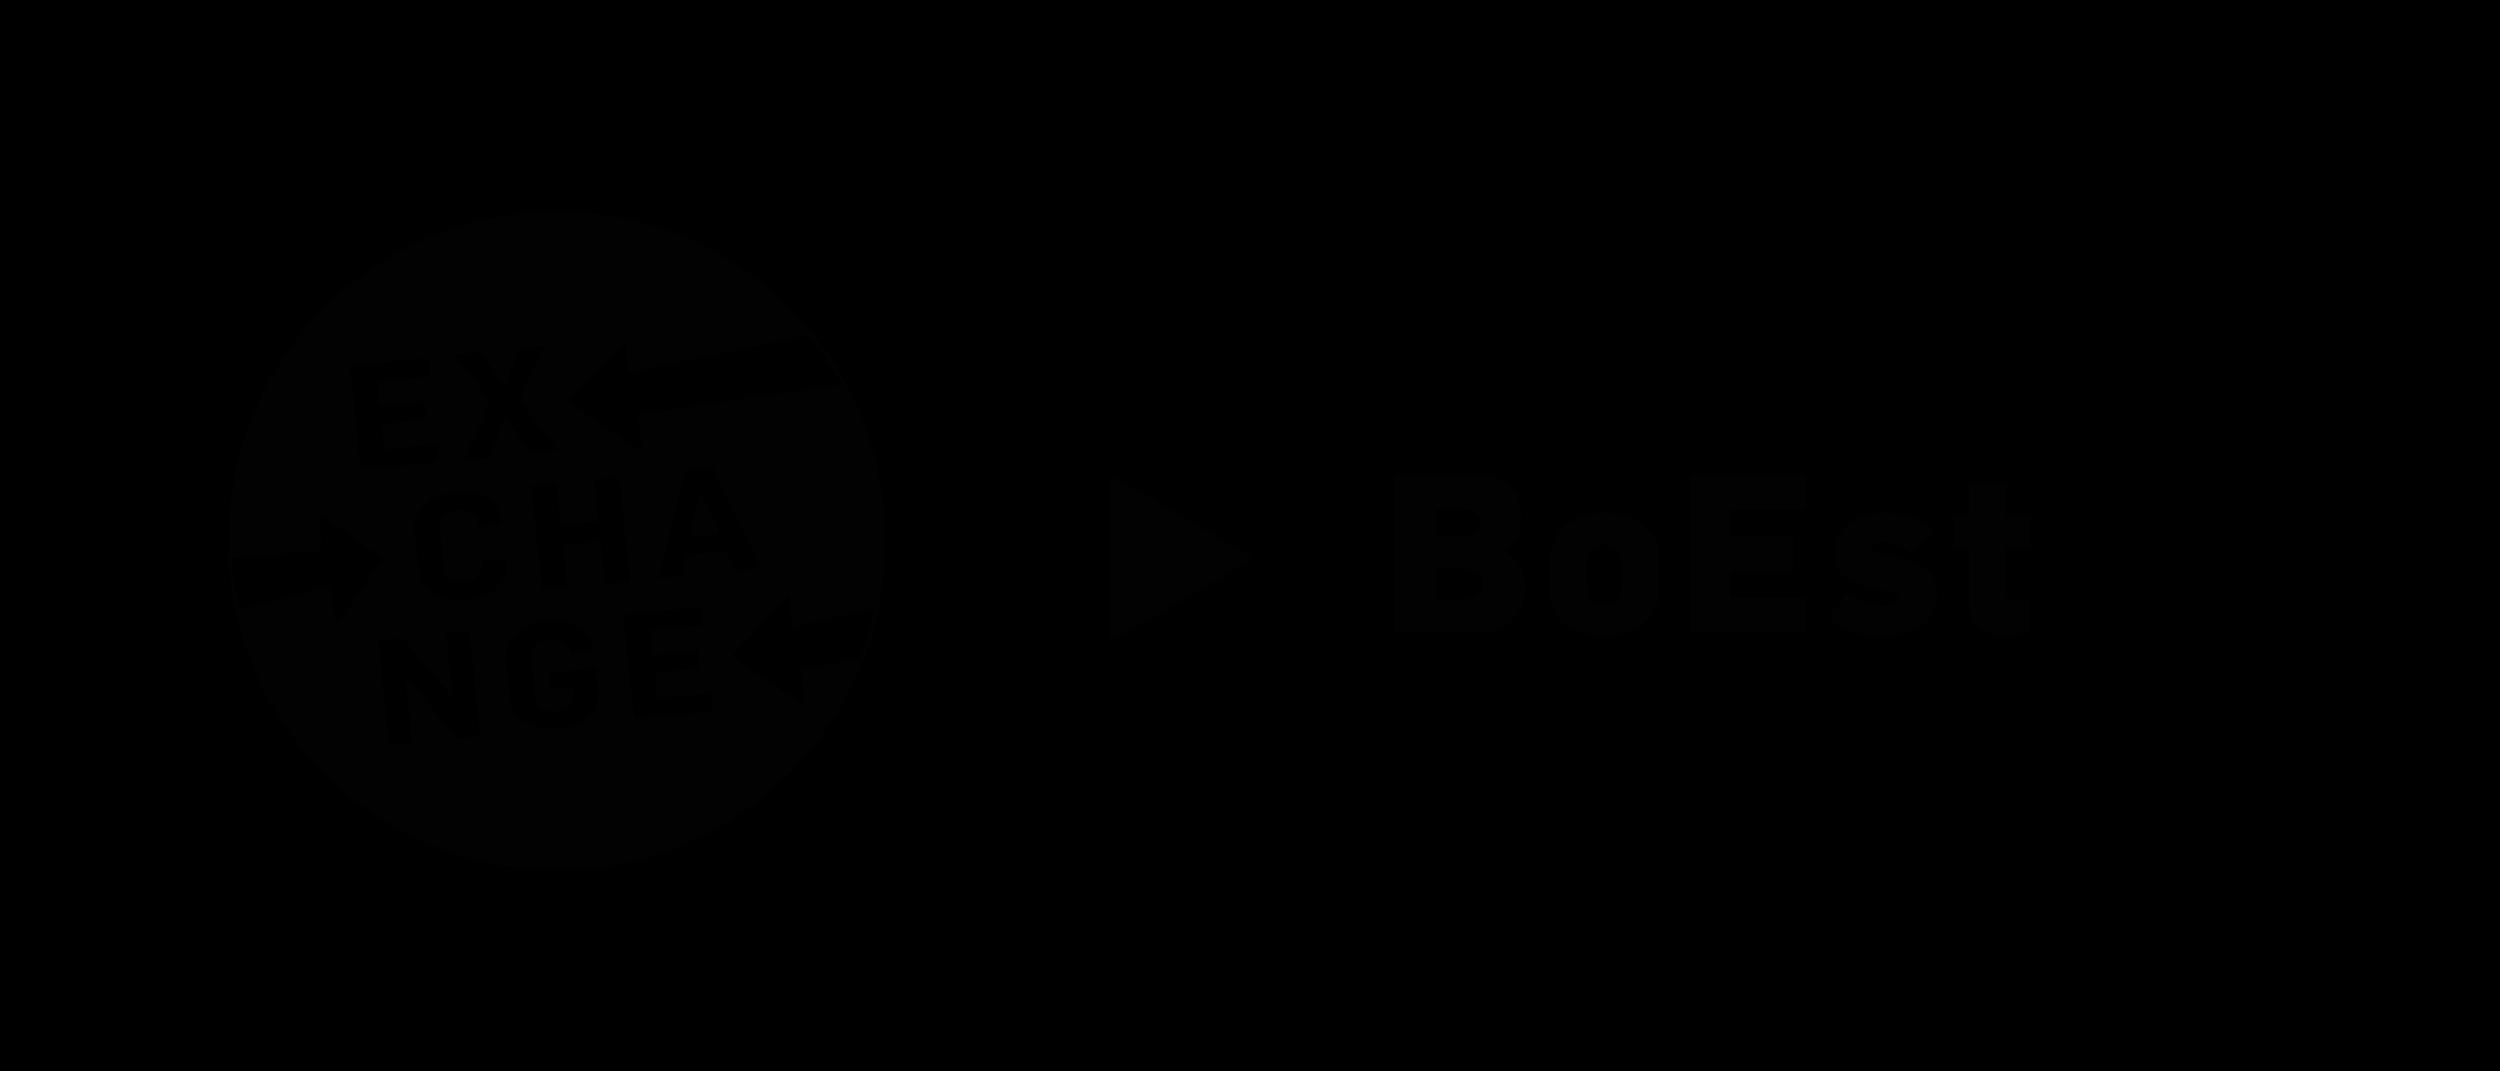 EX2019 BoEst_logocircle_black.png